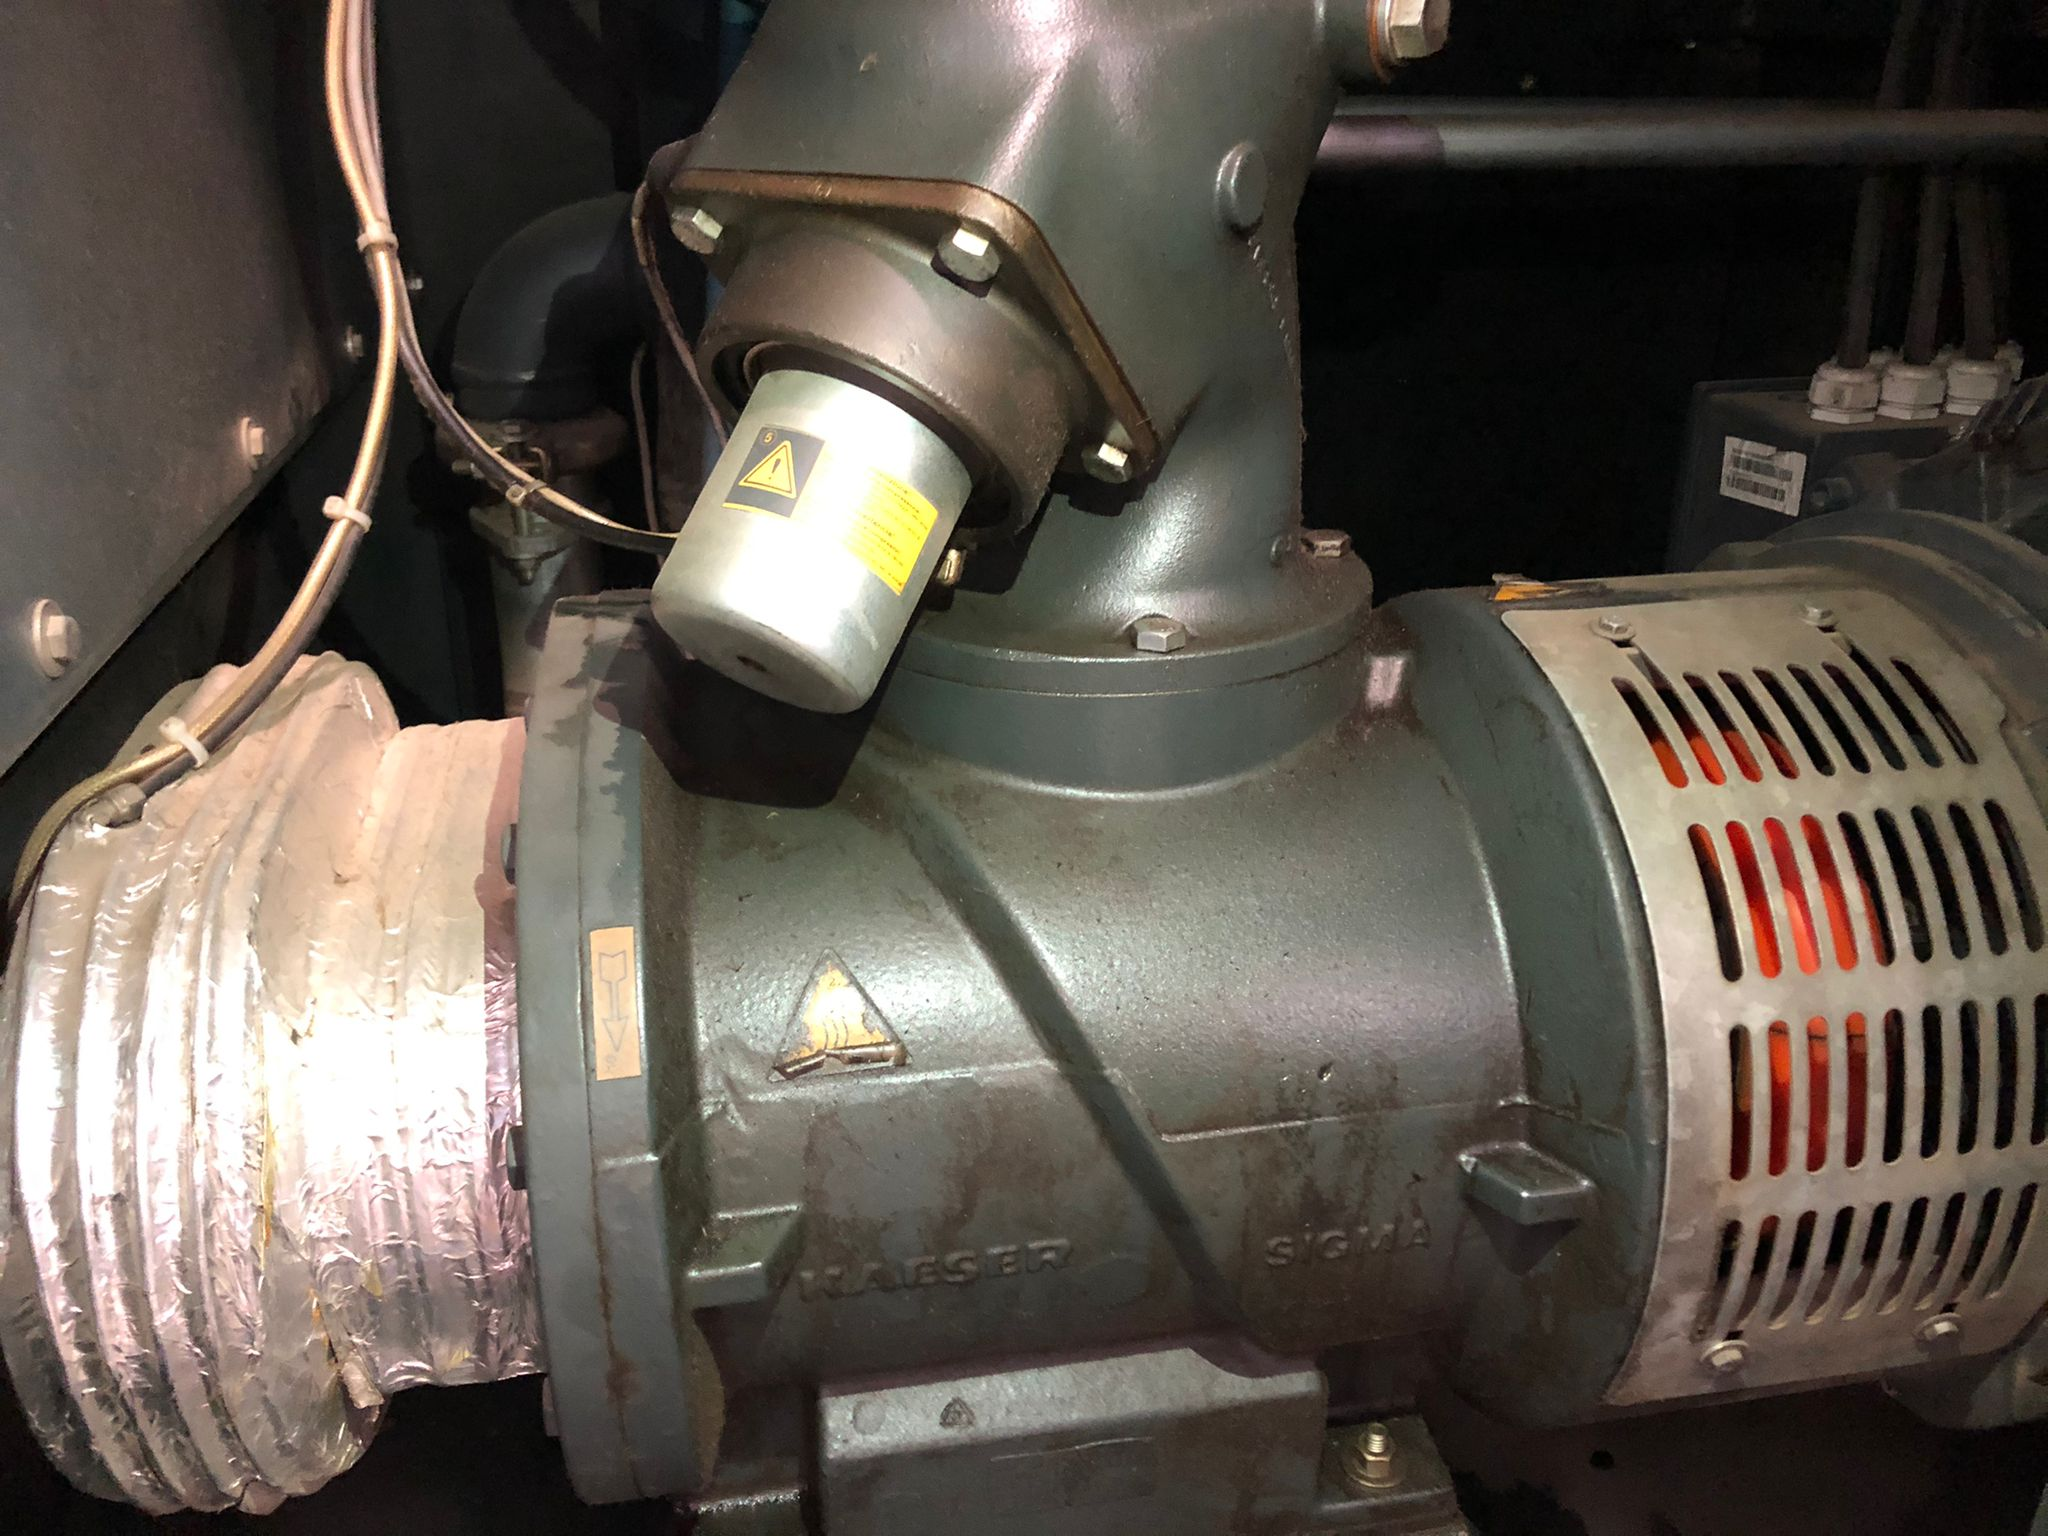 Compressore Kaeser CSDX162 - 90KW in vendita - foto 3